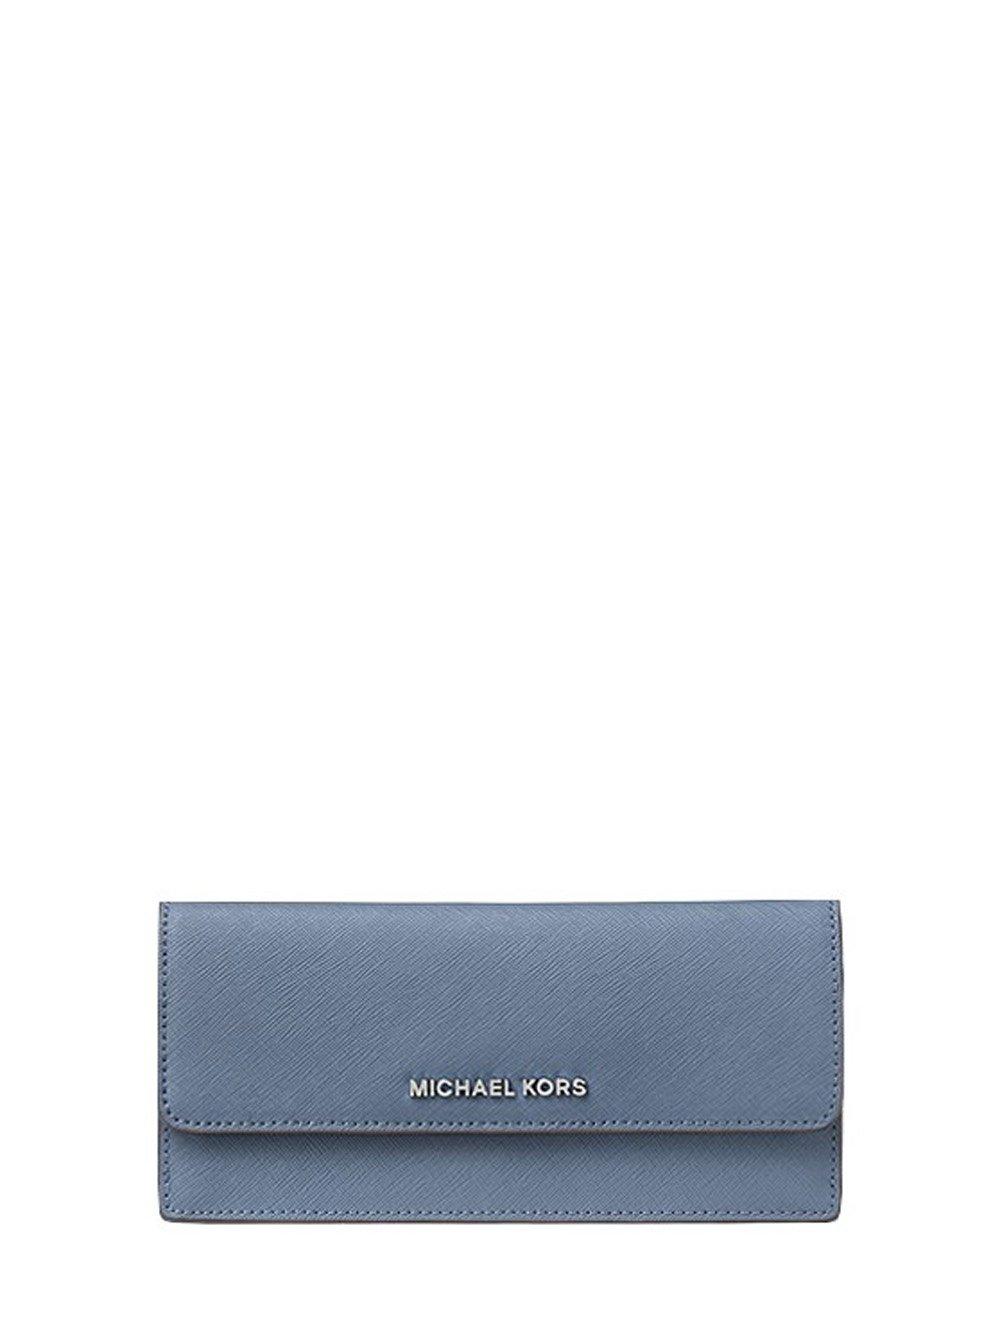 Michael Kors Jet Set Travel Flat Wallet in Saffiano Leather (Denim) by Michael Kors